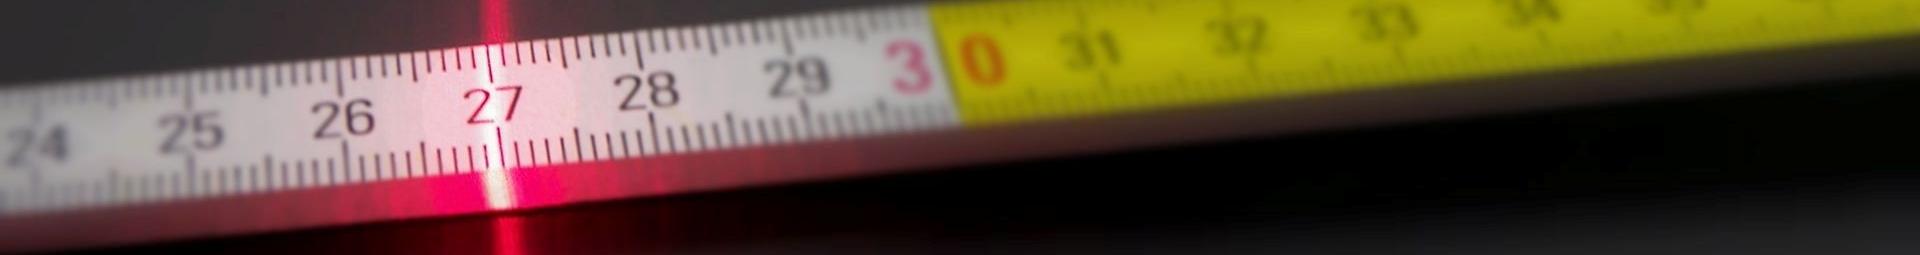 Digitaldruck auf starres Material